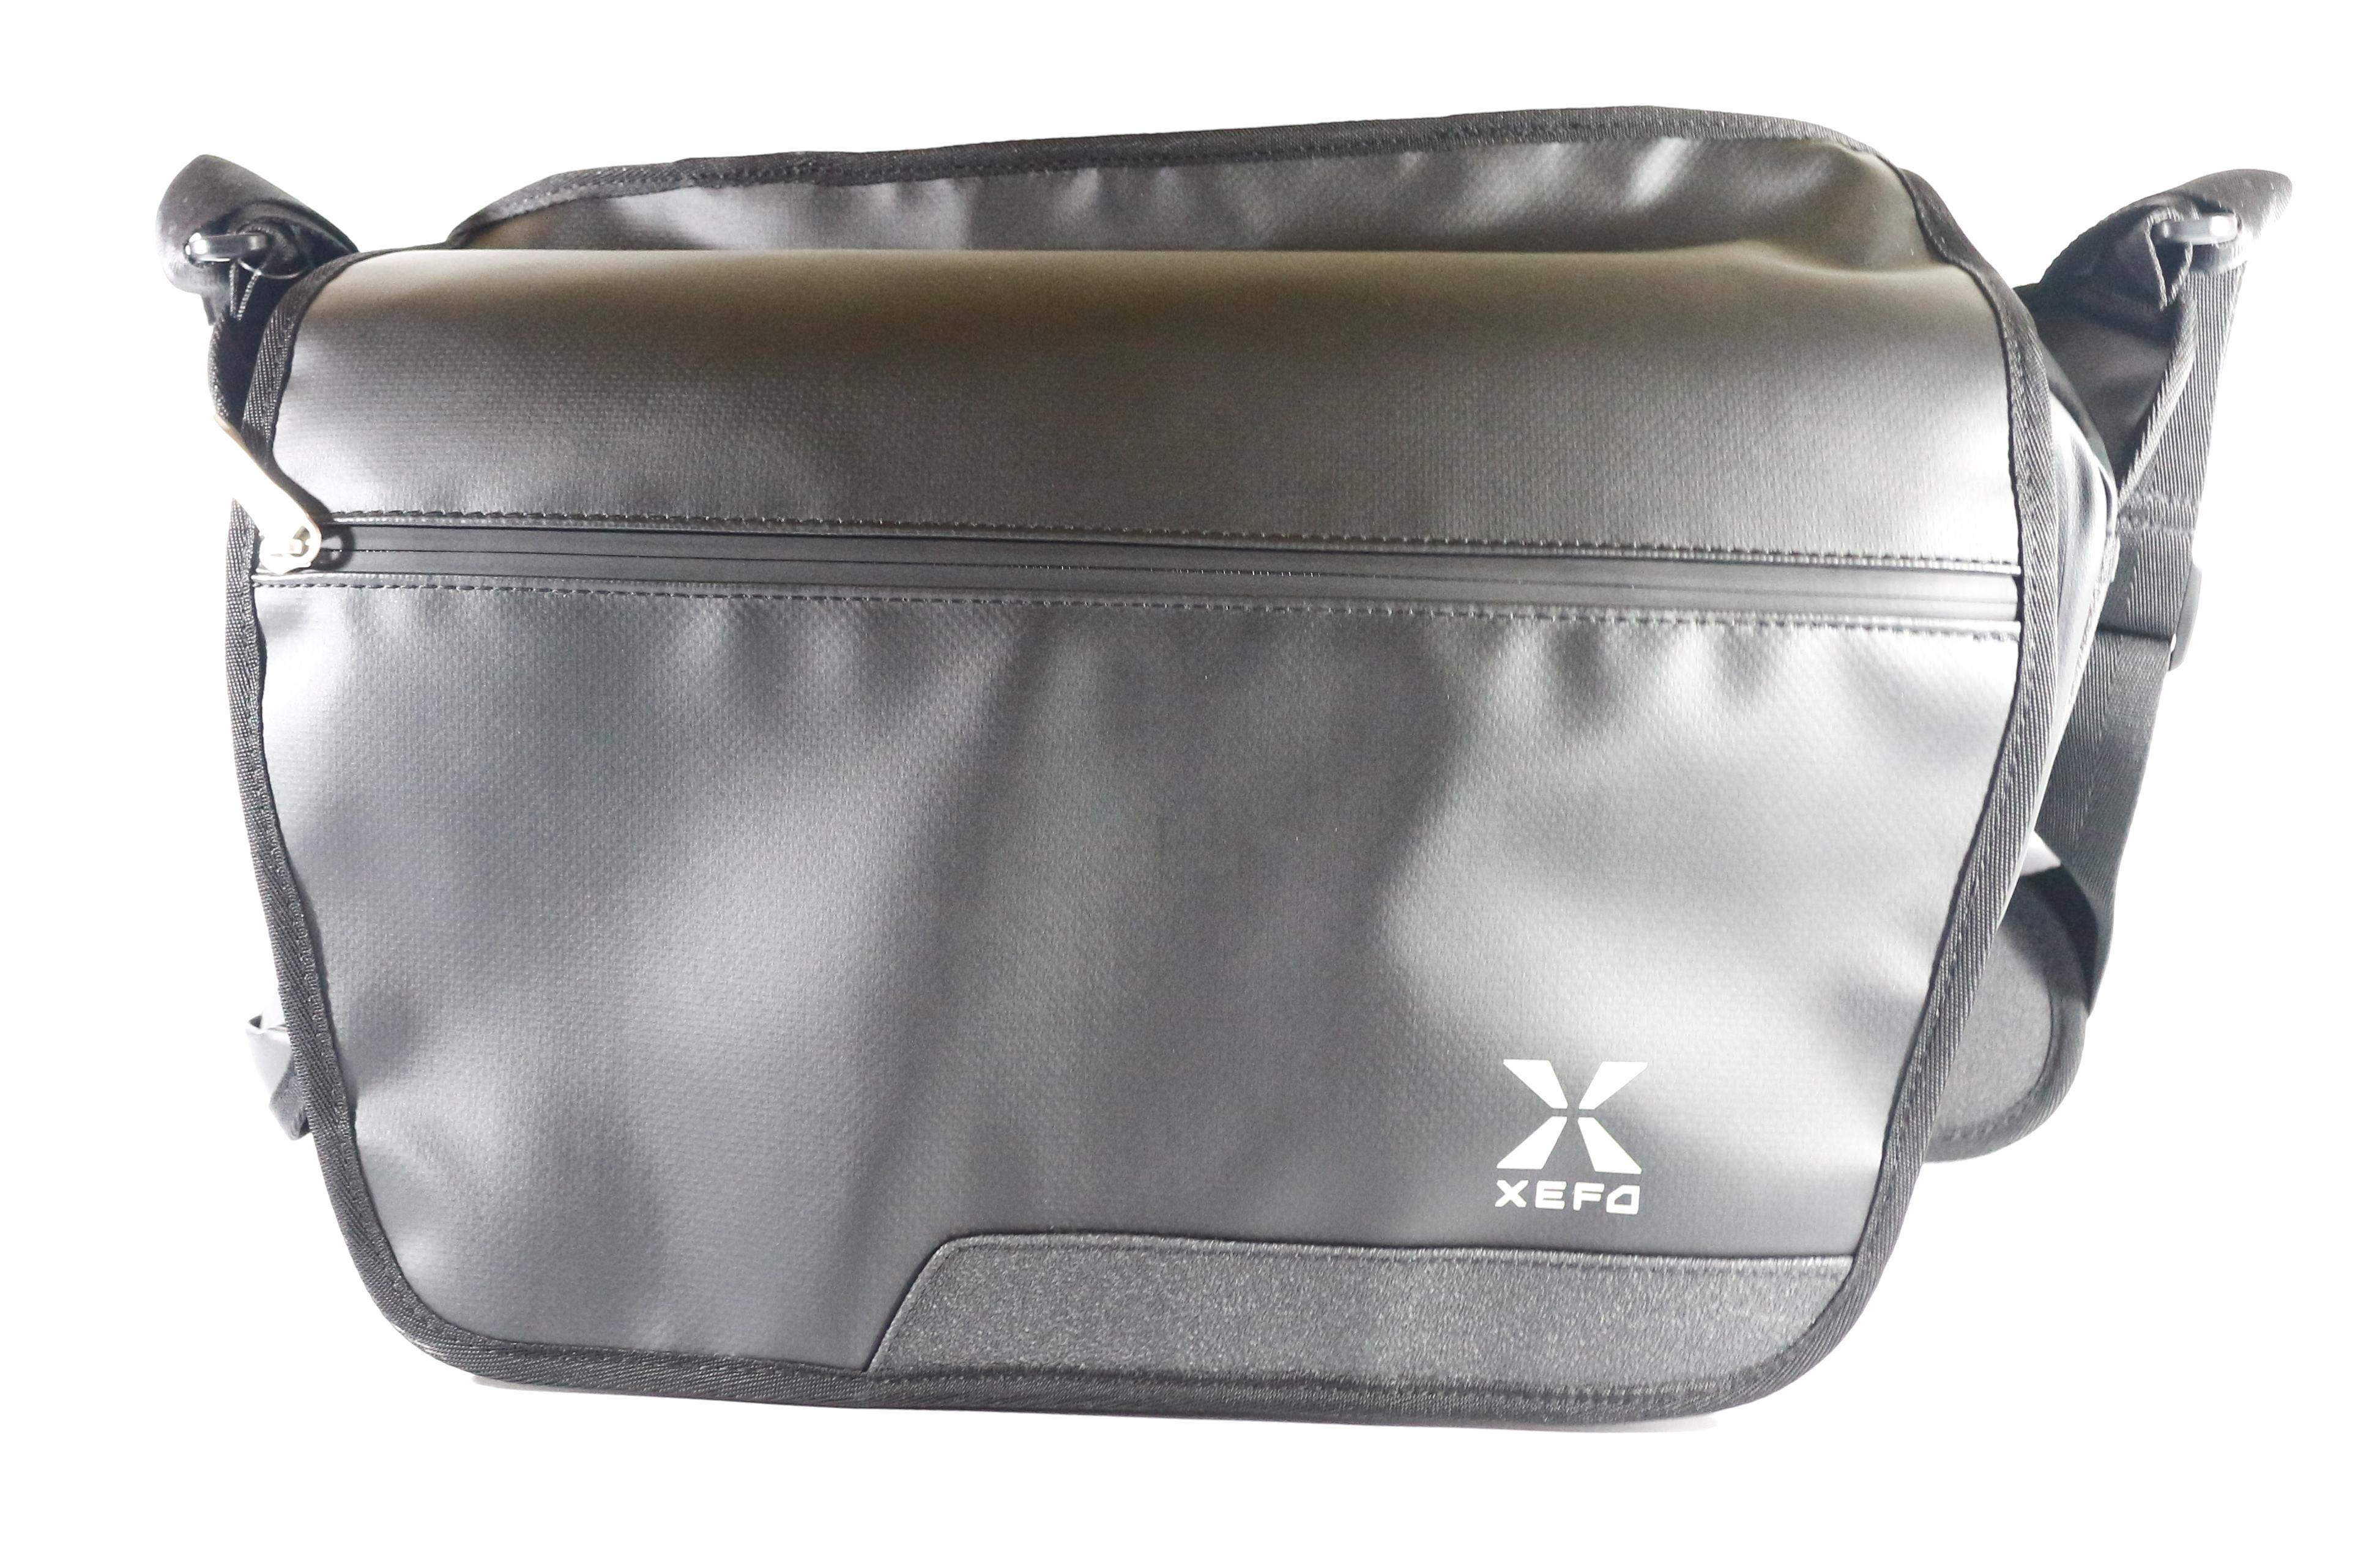 Shimano BS-252I XEFO Shoulder Bag 15.5 x 38 x 29.5 cm Black 703866